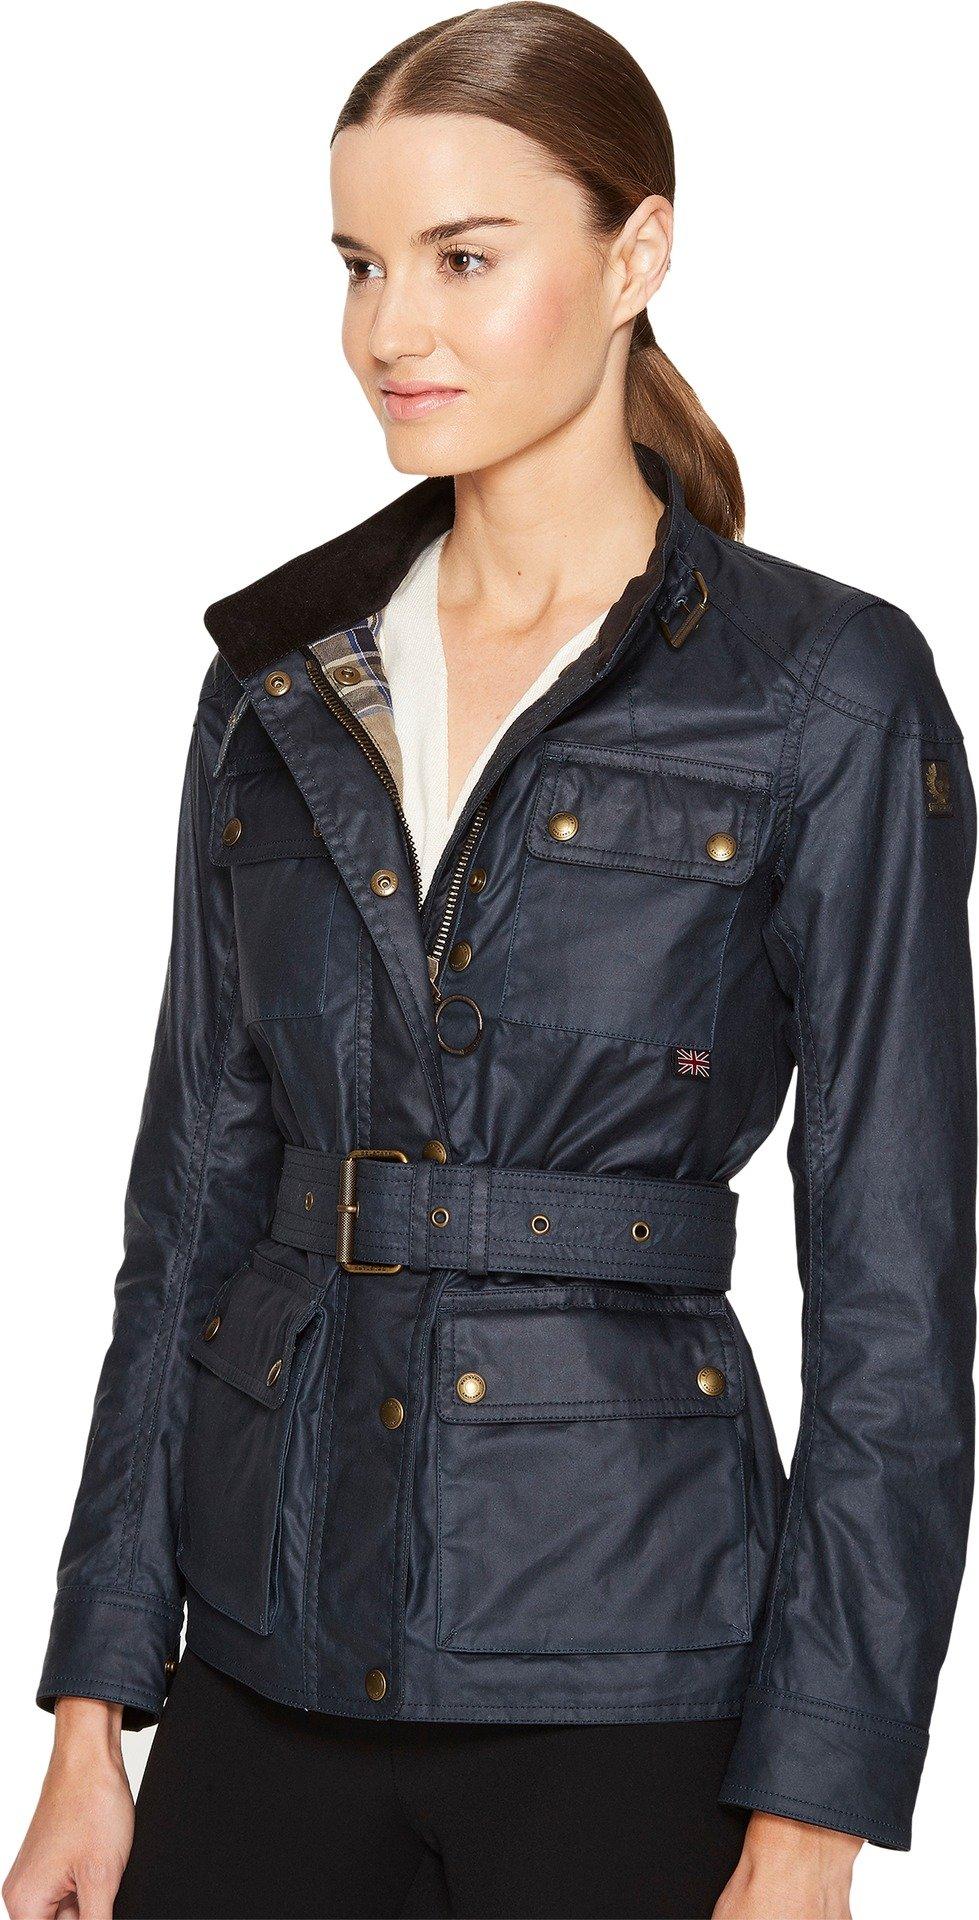 BELSTAFF Women's Roadmaster 2.0 Signature 6 Oz. Wax Cotton Jacket Dark Teal 44 by Belstaff (Image #2)